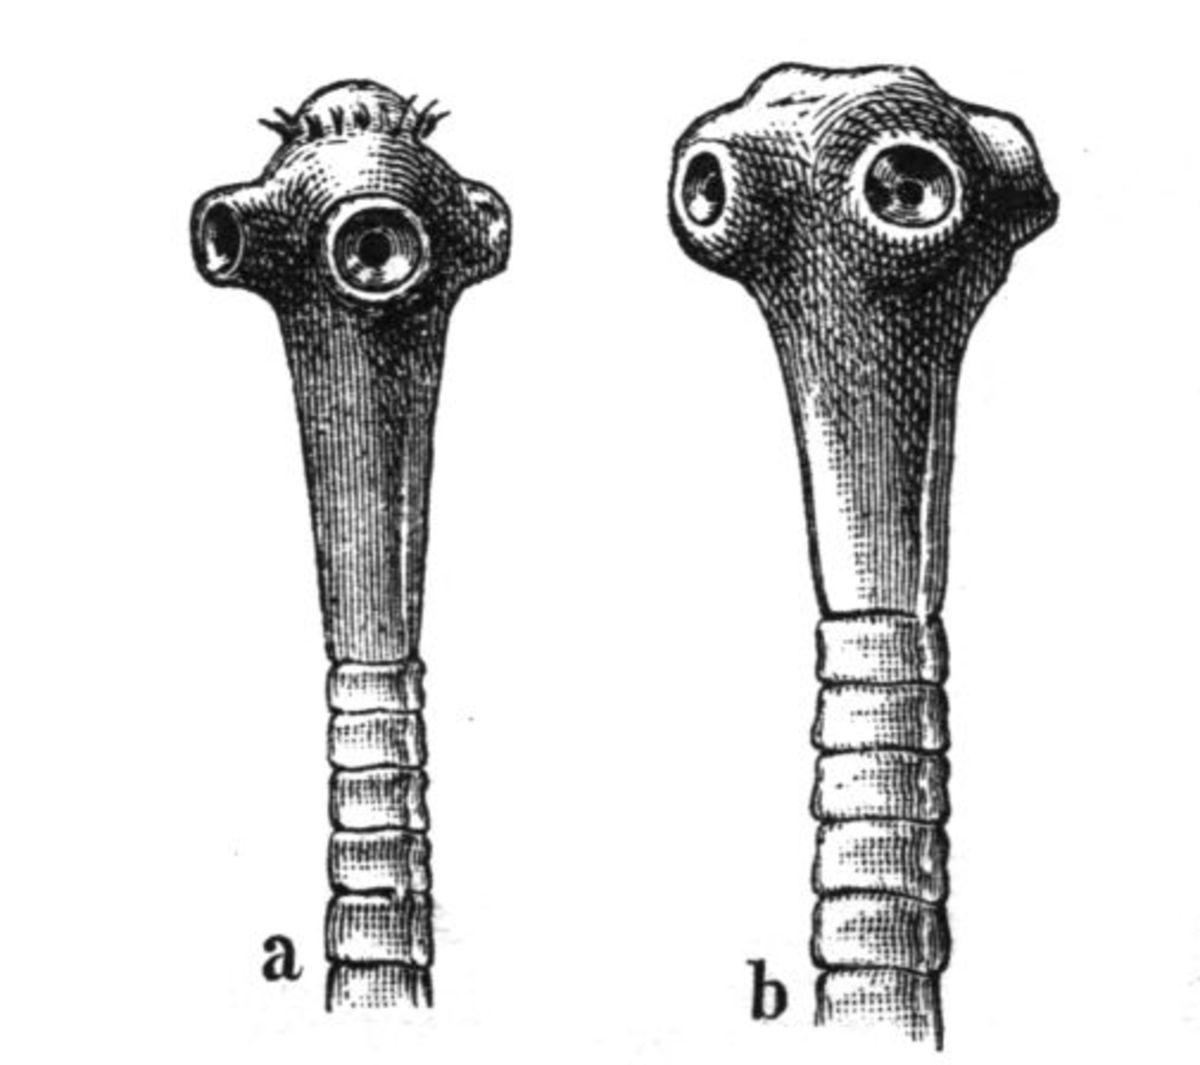 a) Pork Tapeworm, b) Beef Tapeworm